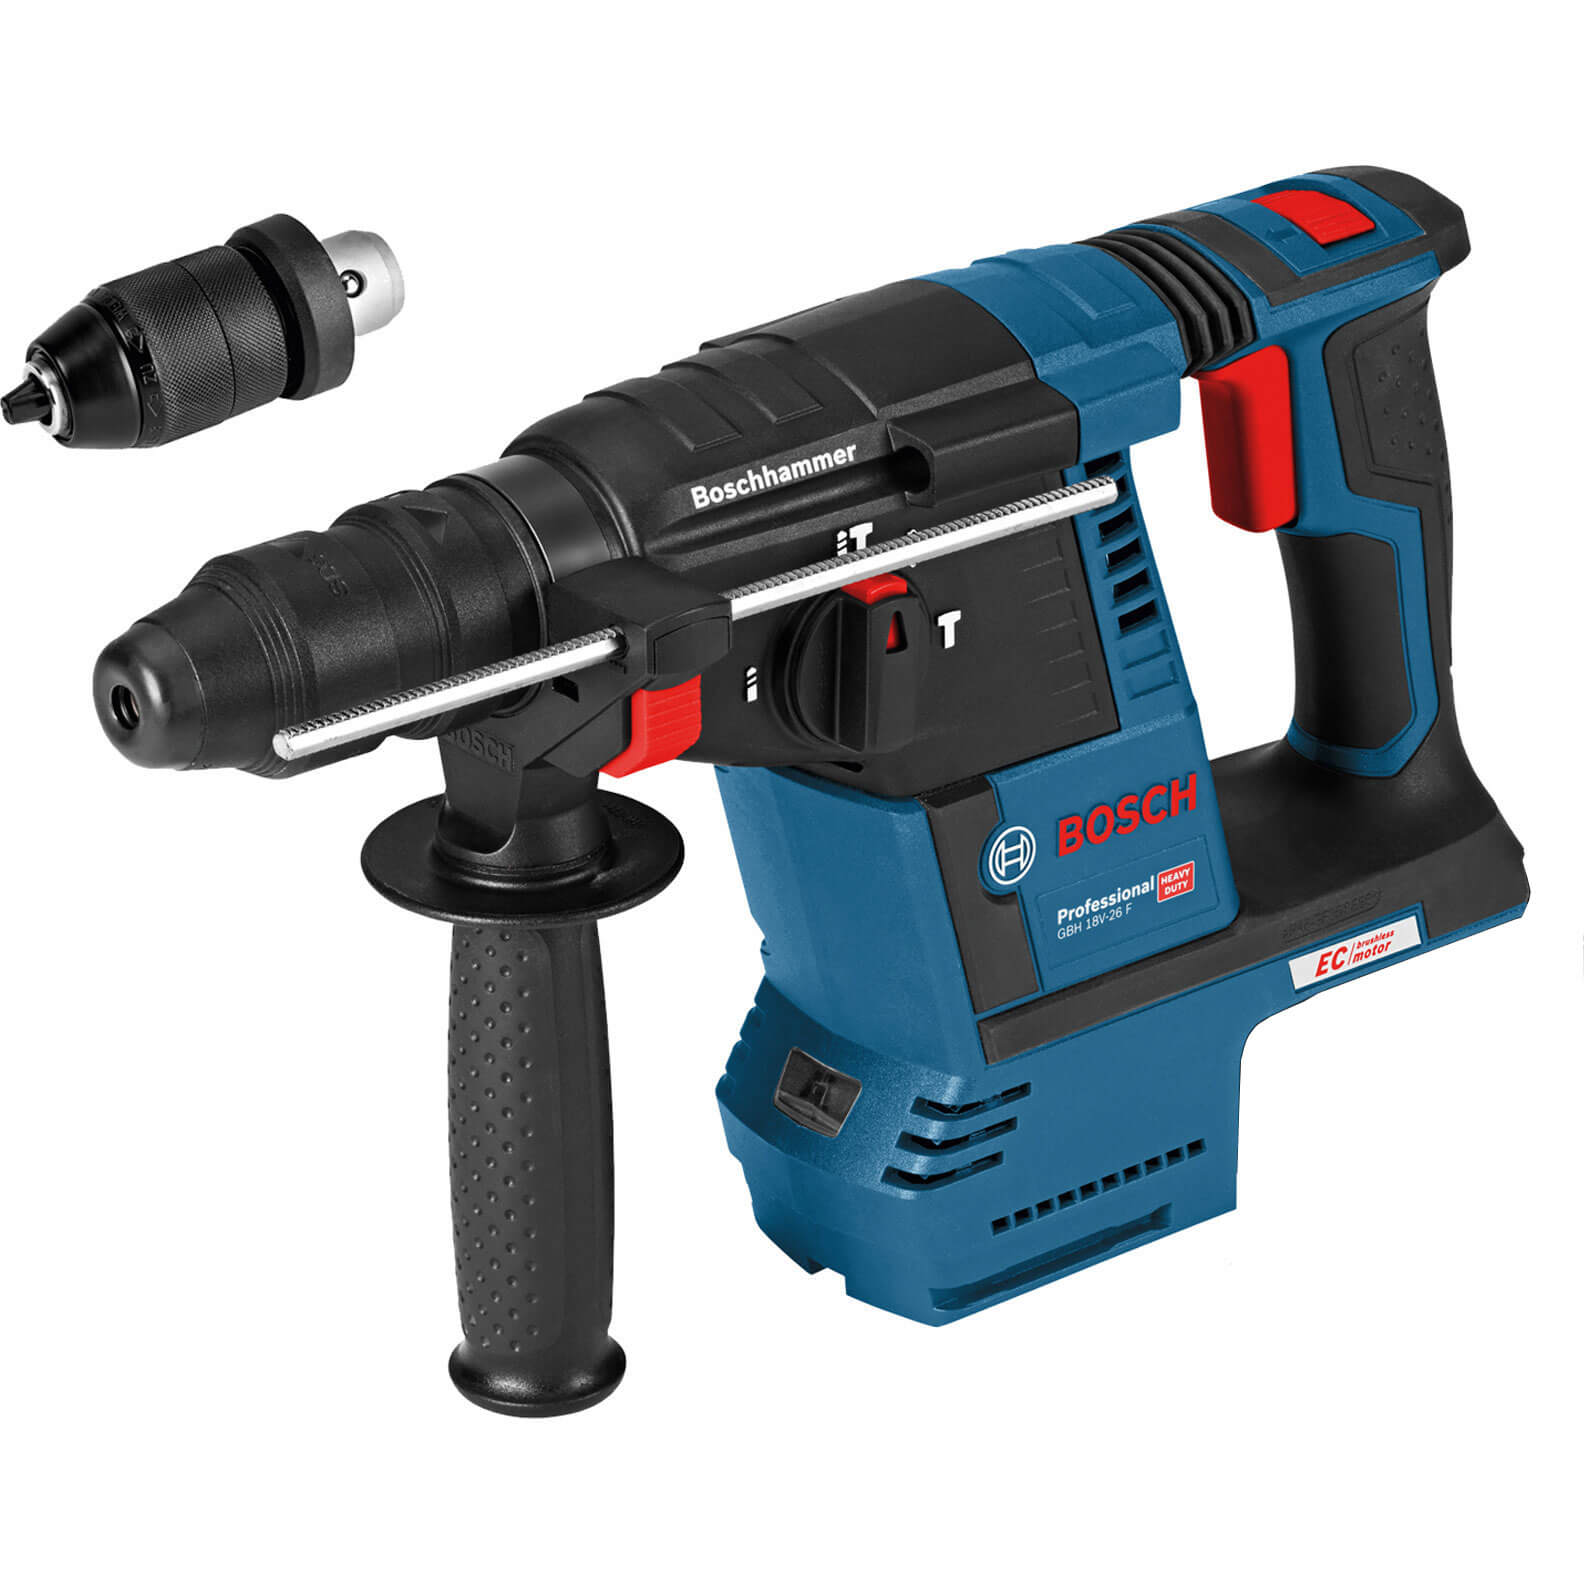 Image of Bosch GBH 18 V-26 F 18v Cordless SDS Drill No Batteries No Charger No Case